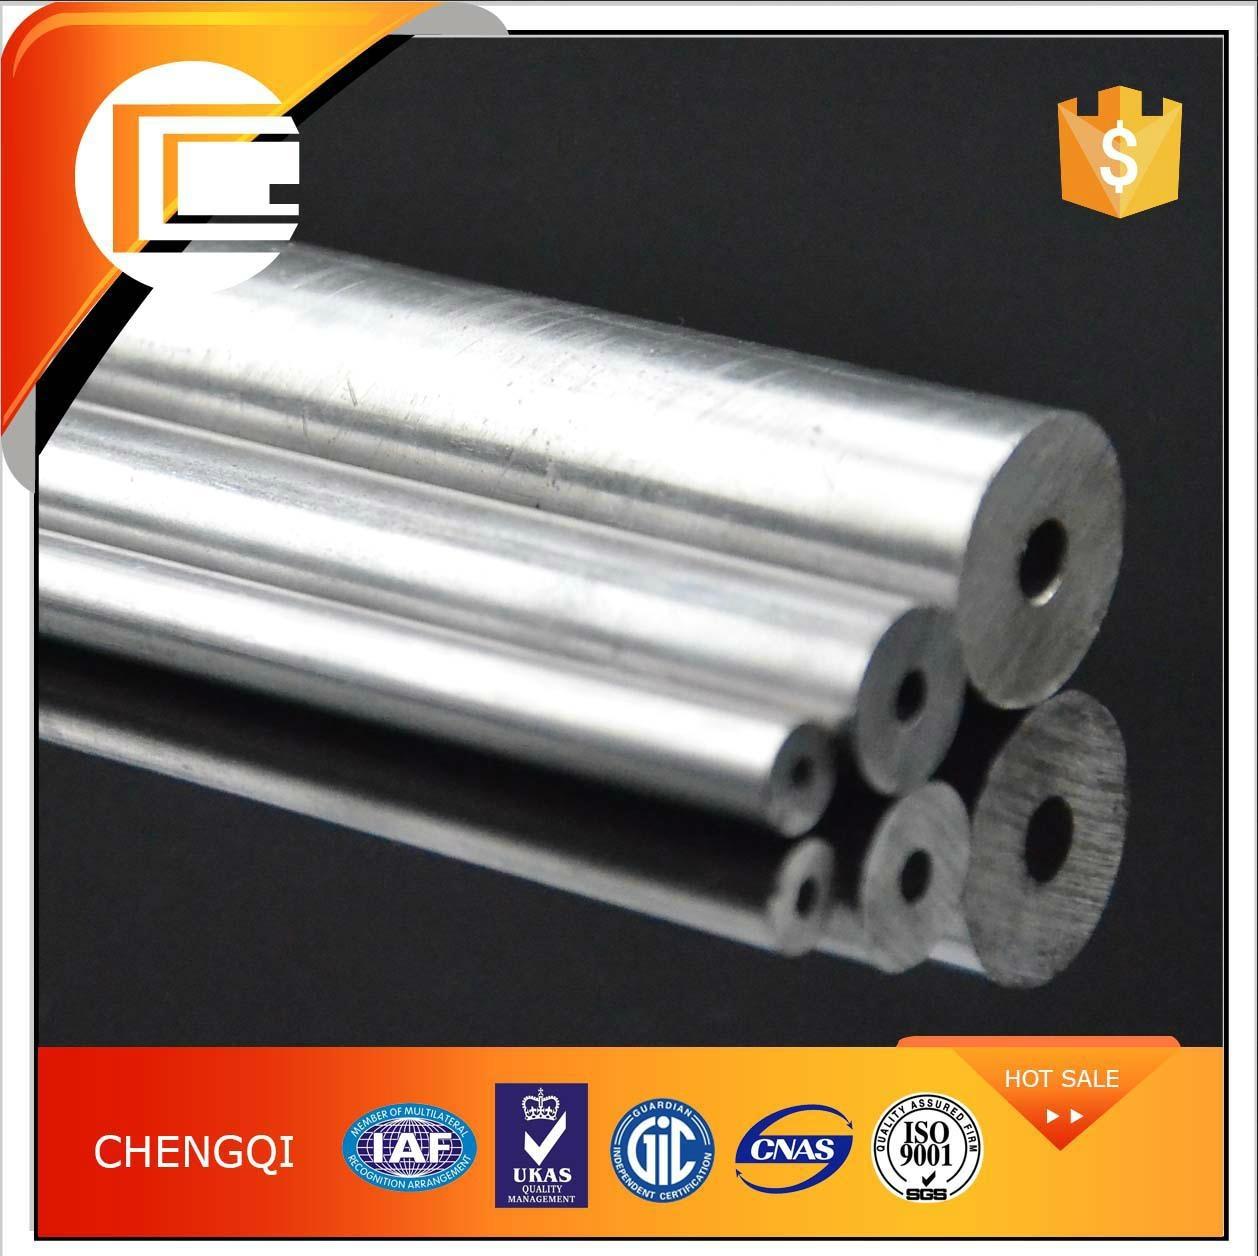 GB 16Mn alloy pipe price list mild carbon steel tube 1